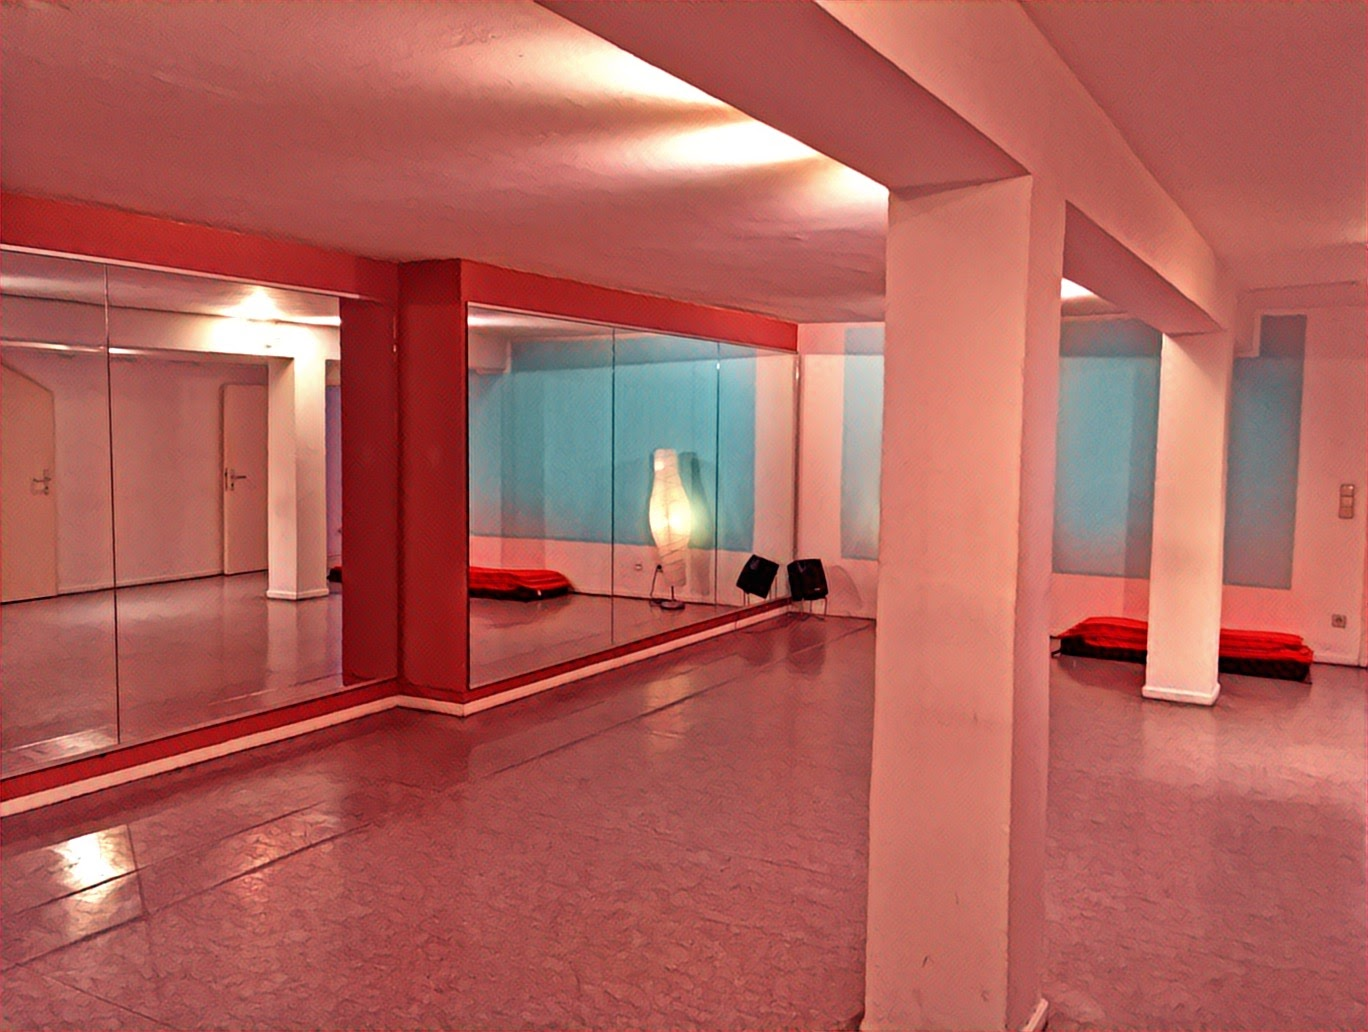 Tanzraum 2, Jump in Tanzschule, Tanzstudio München